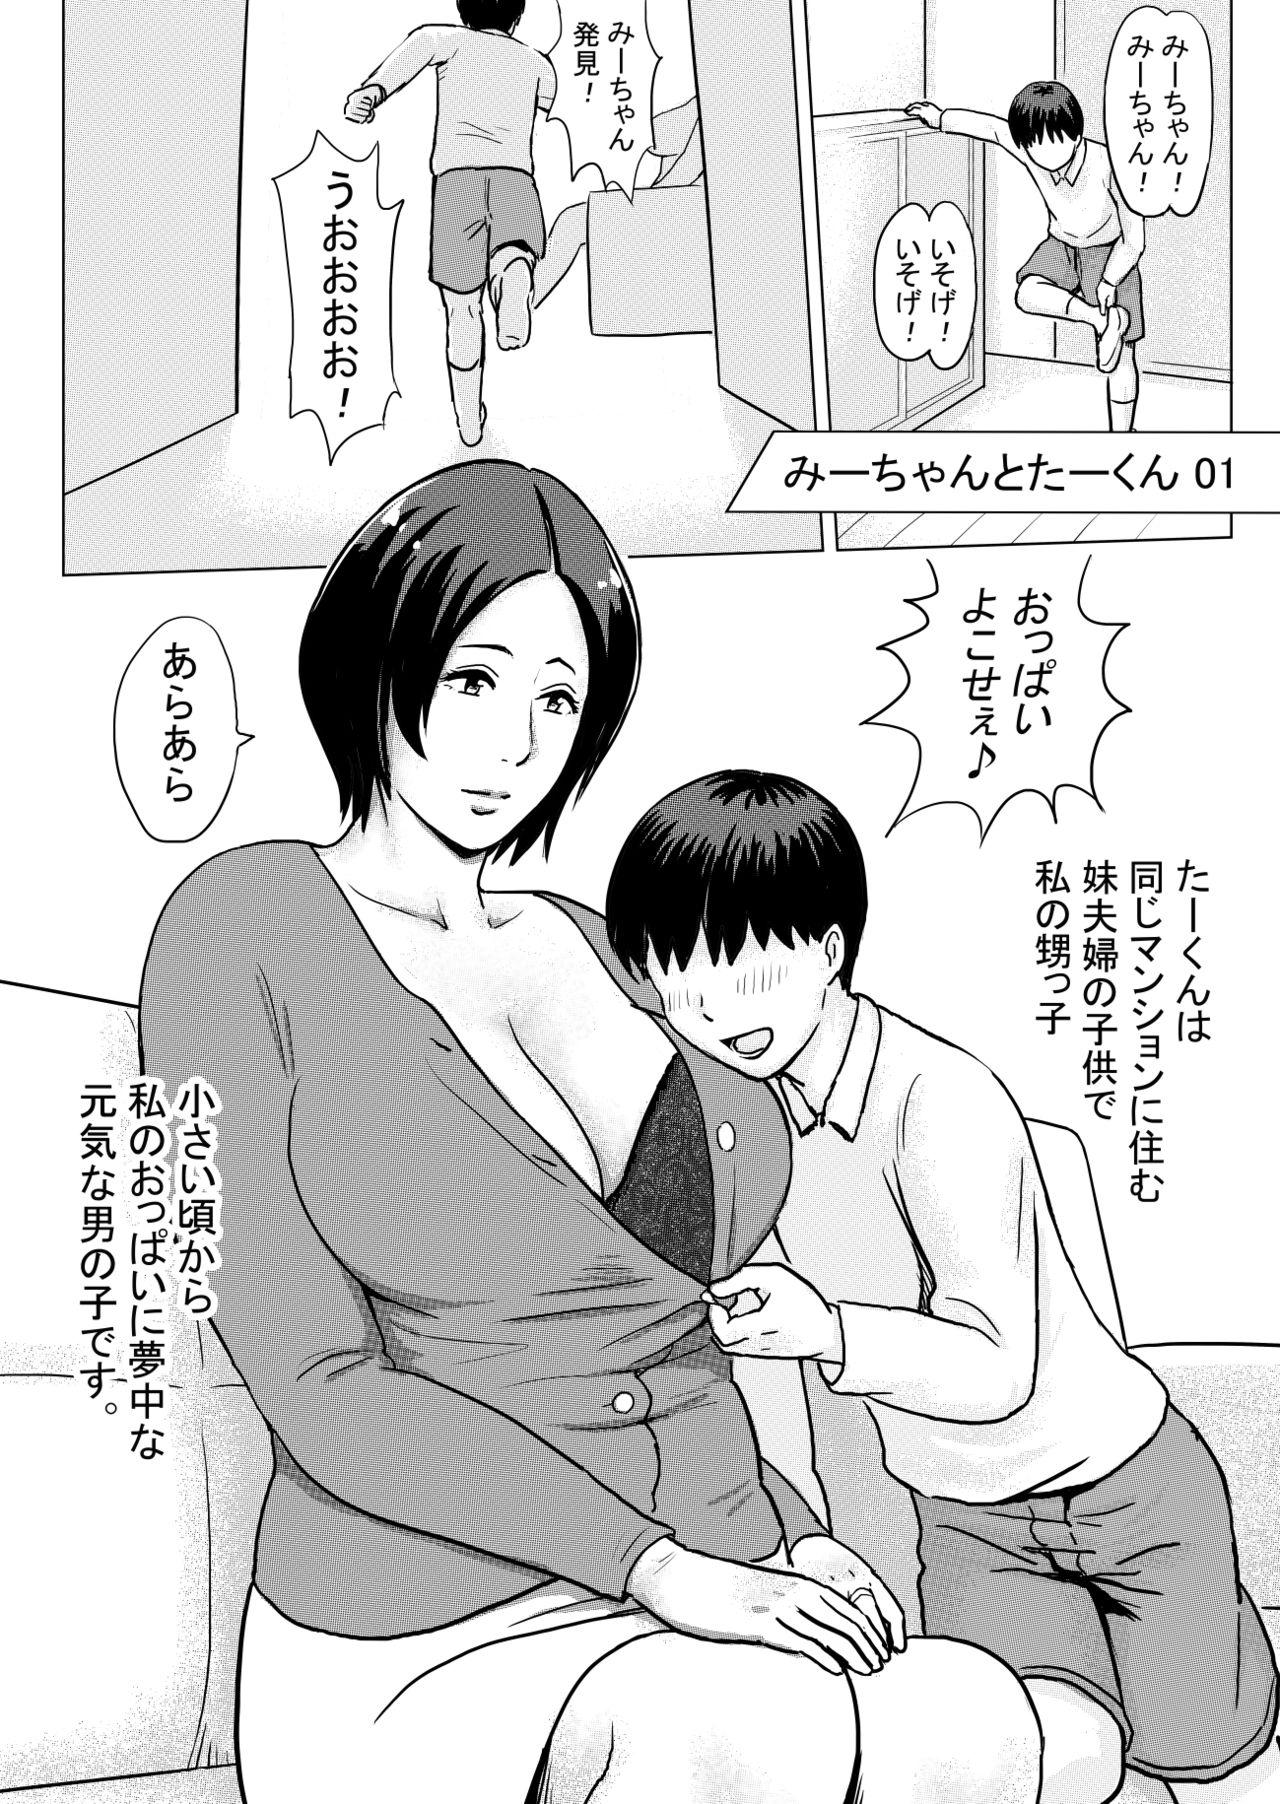 [Vulcan Nure] Mii-chan to Taa-kun 0